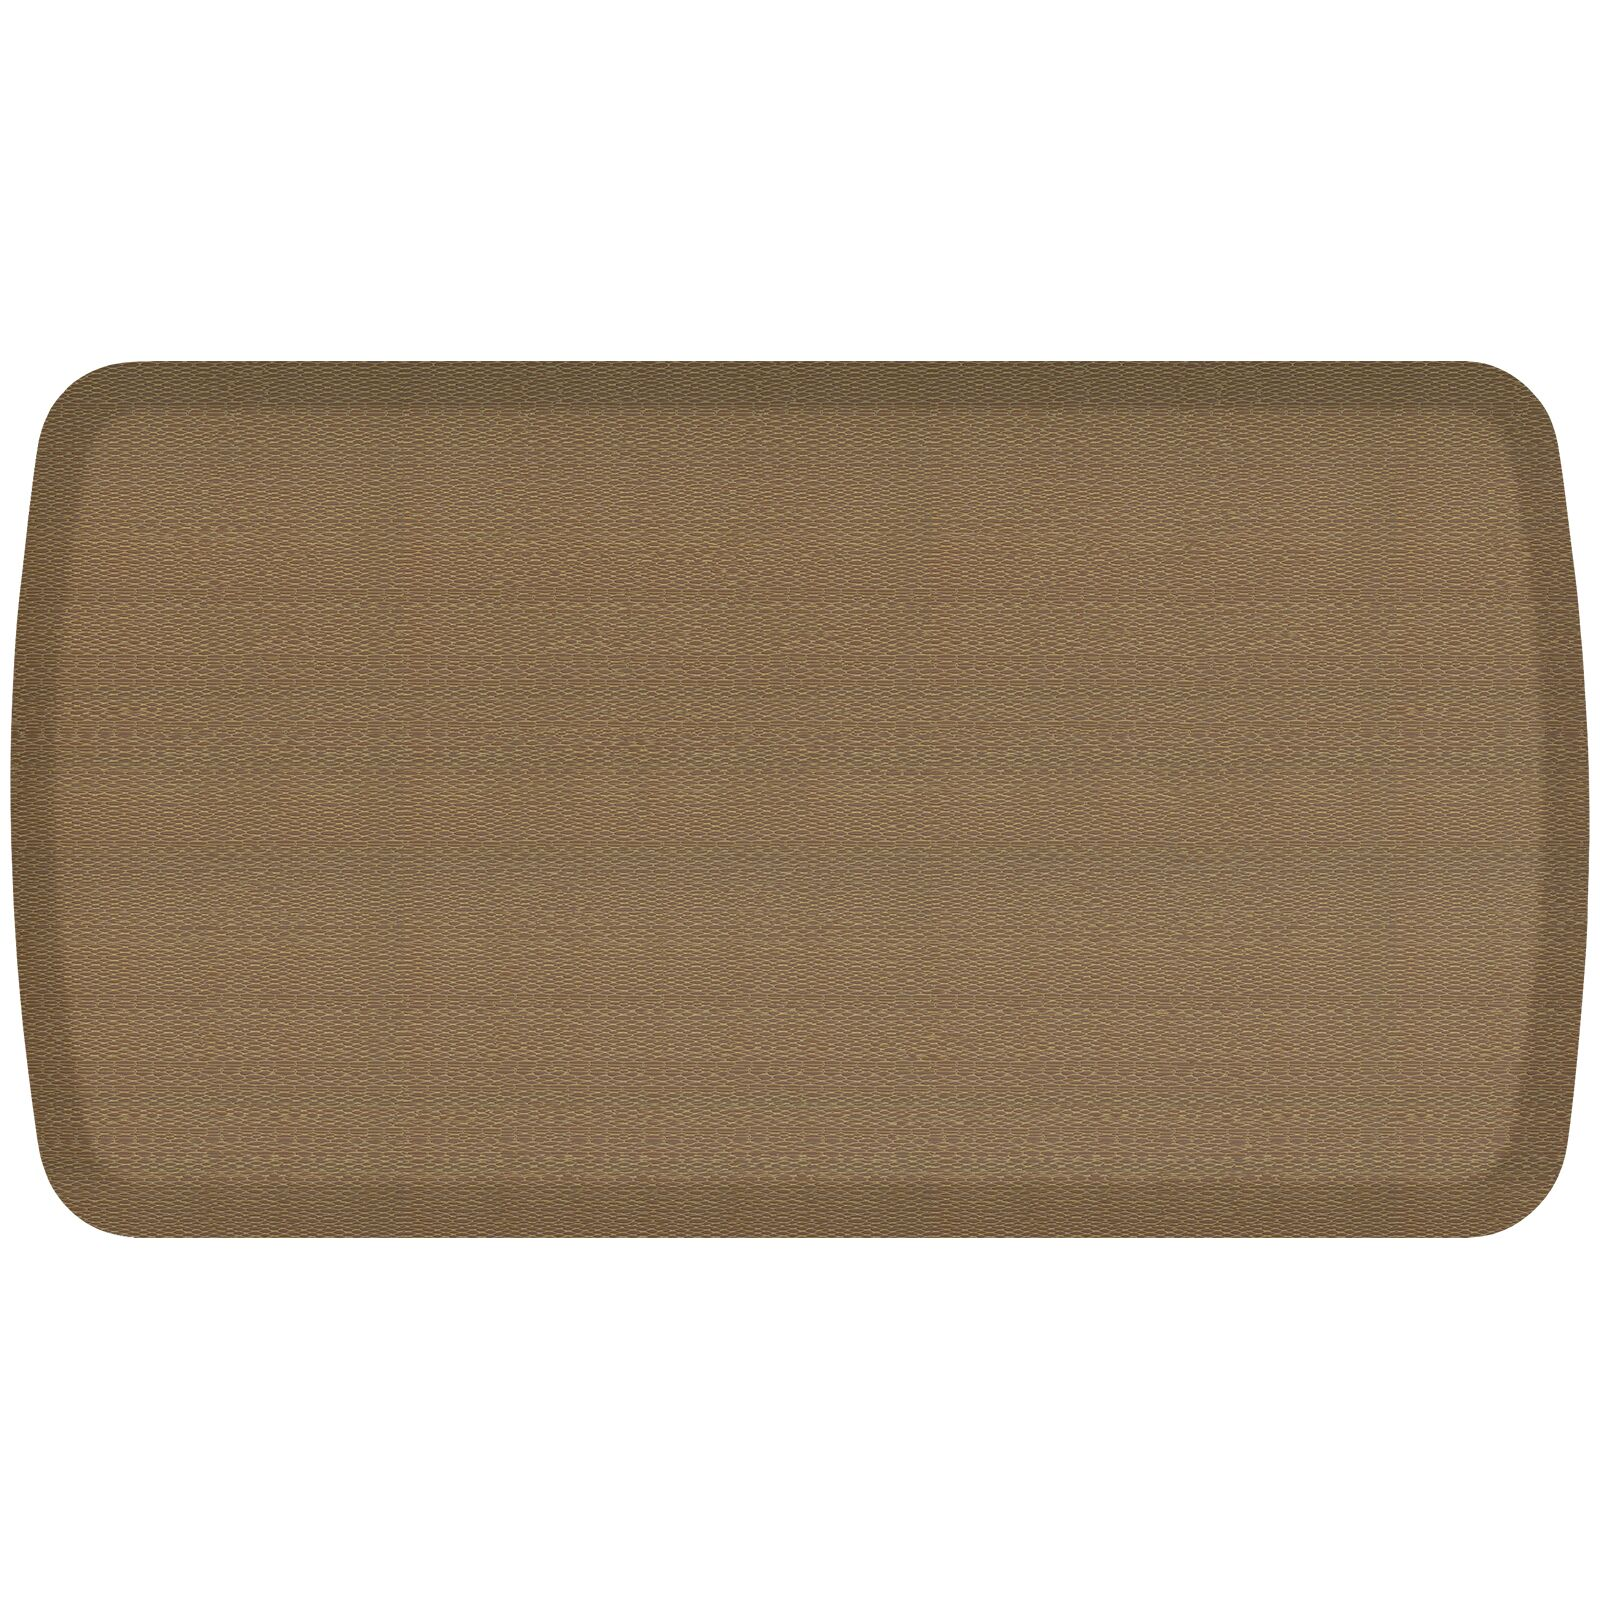 Rattan Elite Premier Comfort Kitchen Mat Mat Size: 1'8